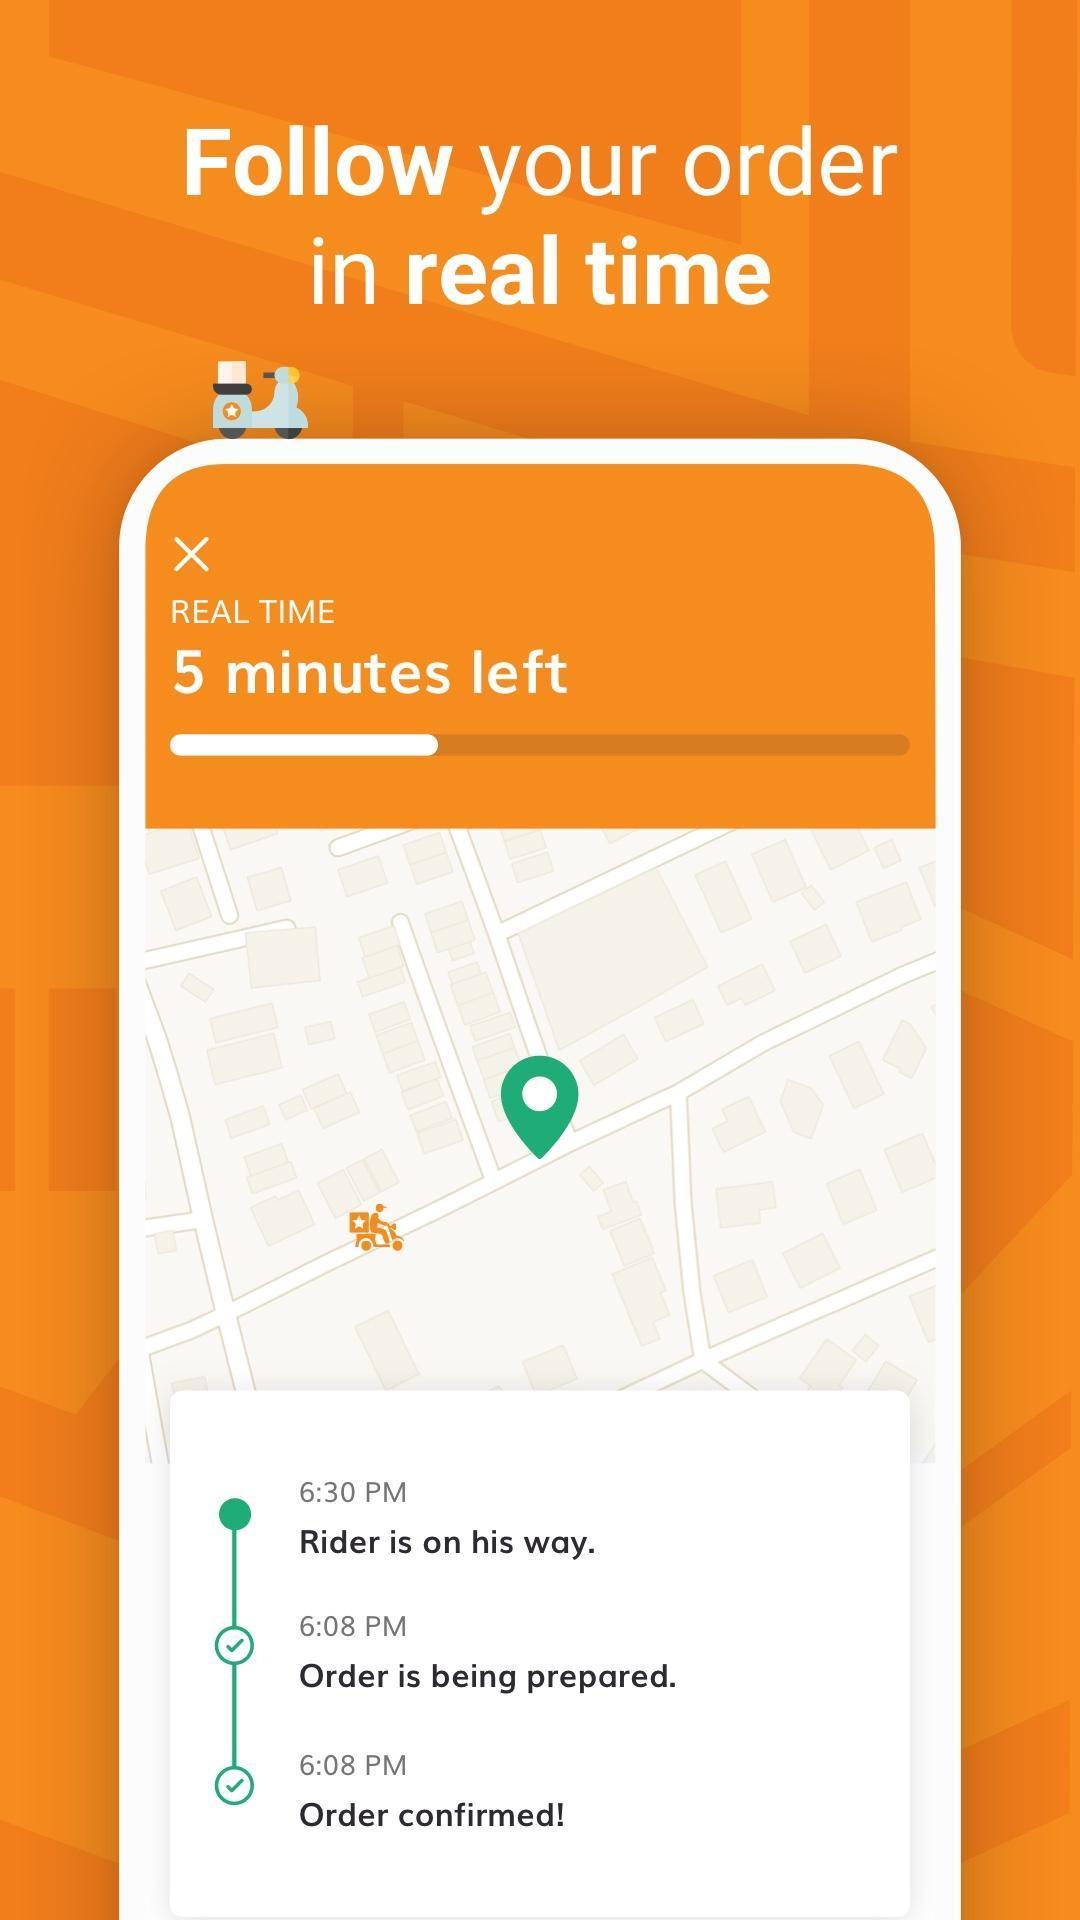 Jumia Food Local Food Delivery near You 4.3.1 Screenshot 6